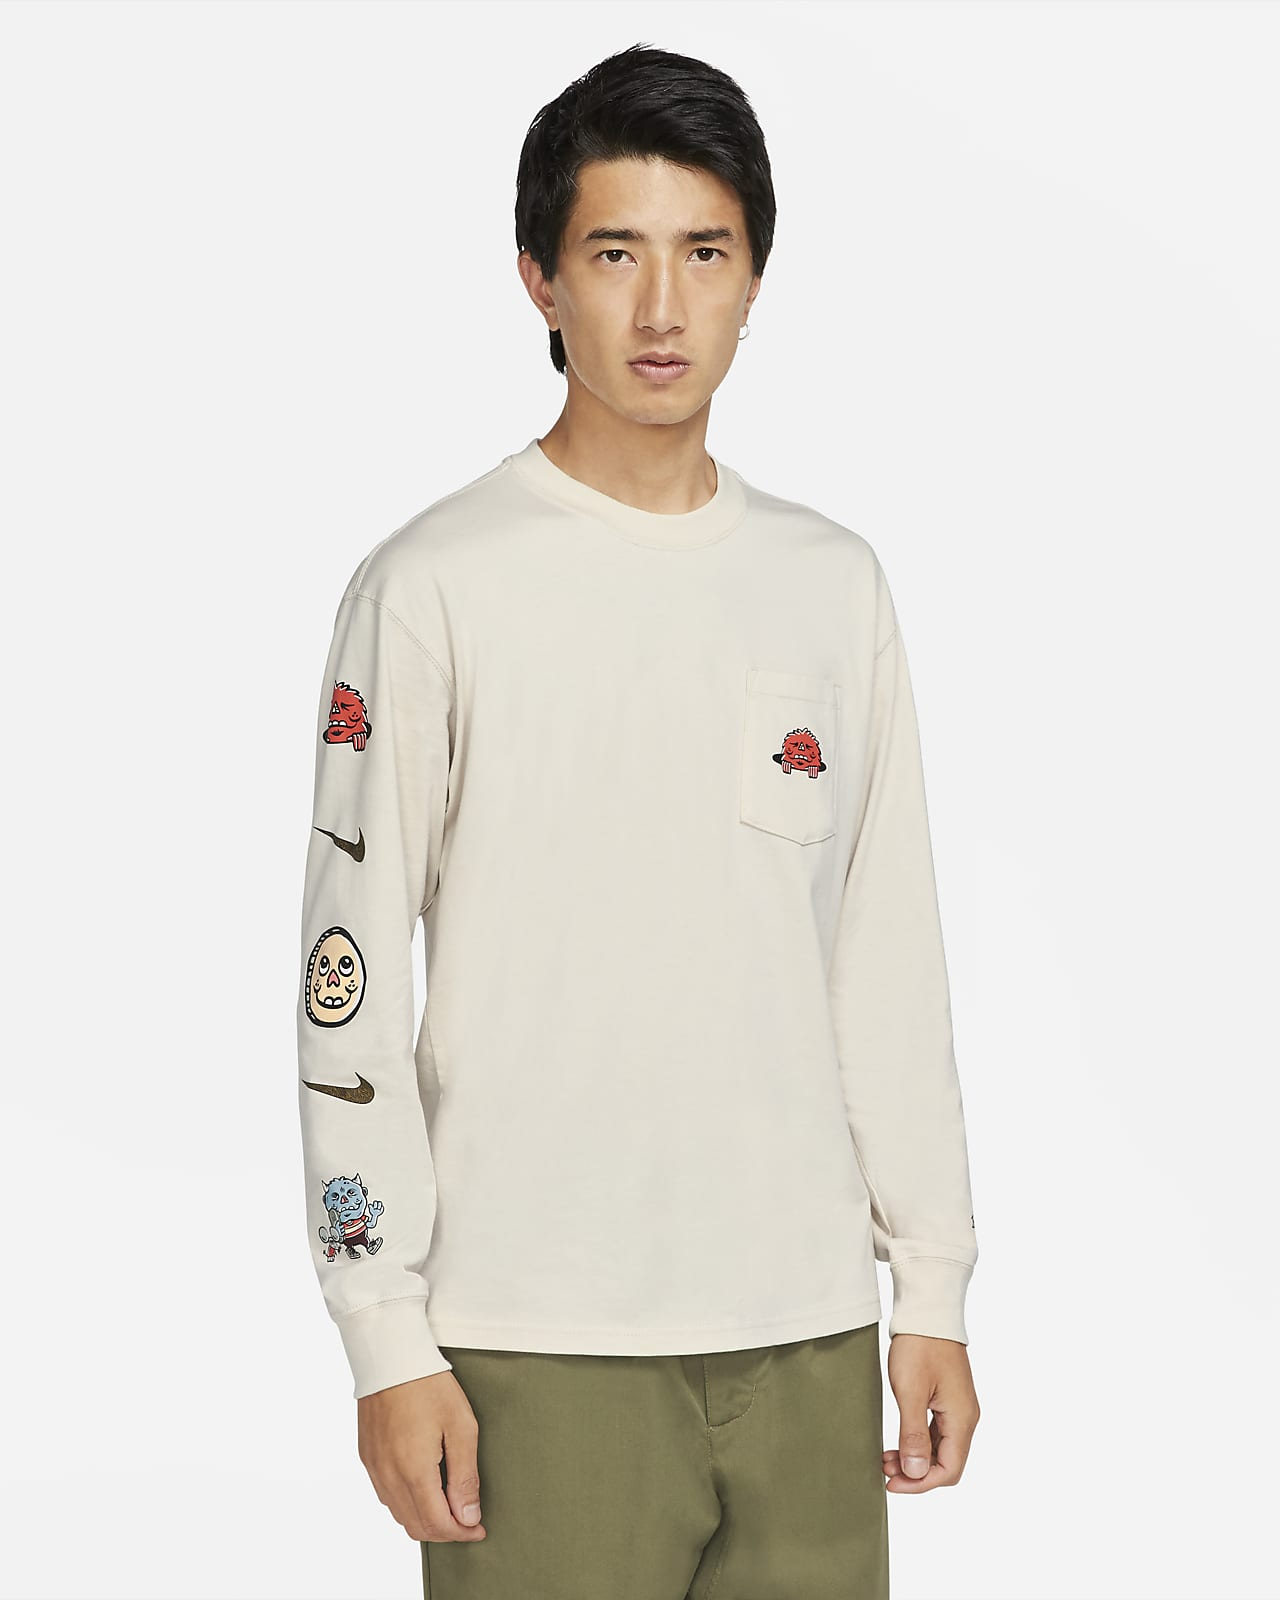 Nike SB Men's Long-Sleeve Pocket Skate T-Shirt